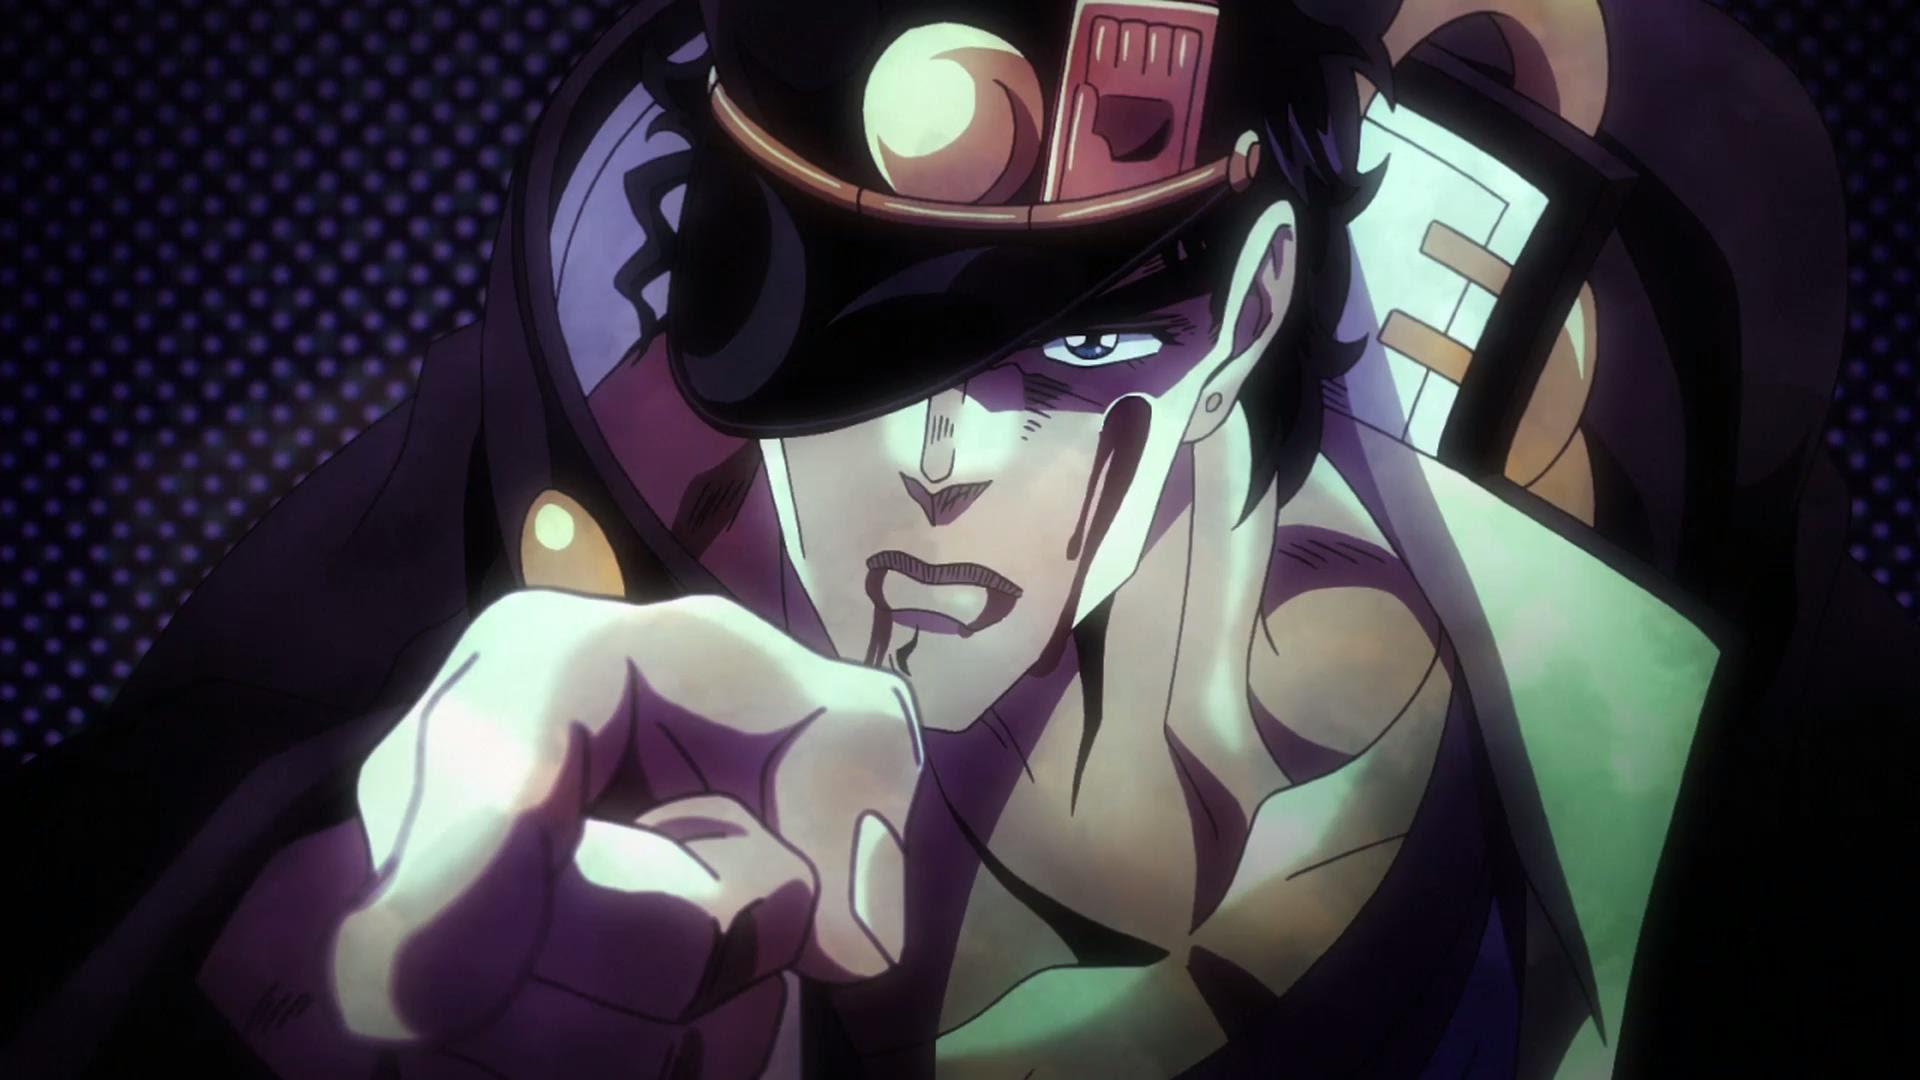 Kujo Jotaro vs Kakyoin Noriaki (JoJo's Bizarre Adventure: Stardust  Crusaders) (Sub. Espa̱ol) РYouTube